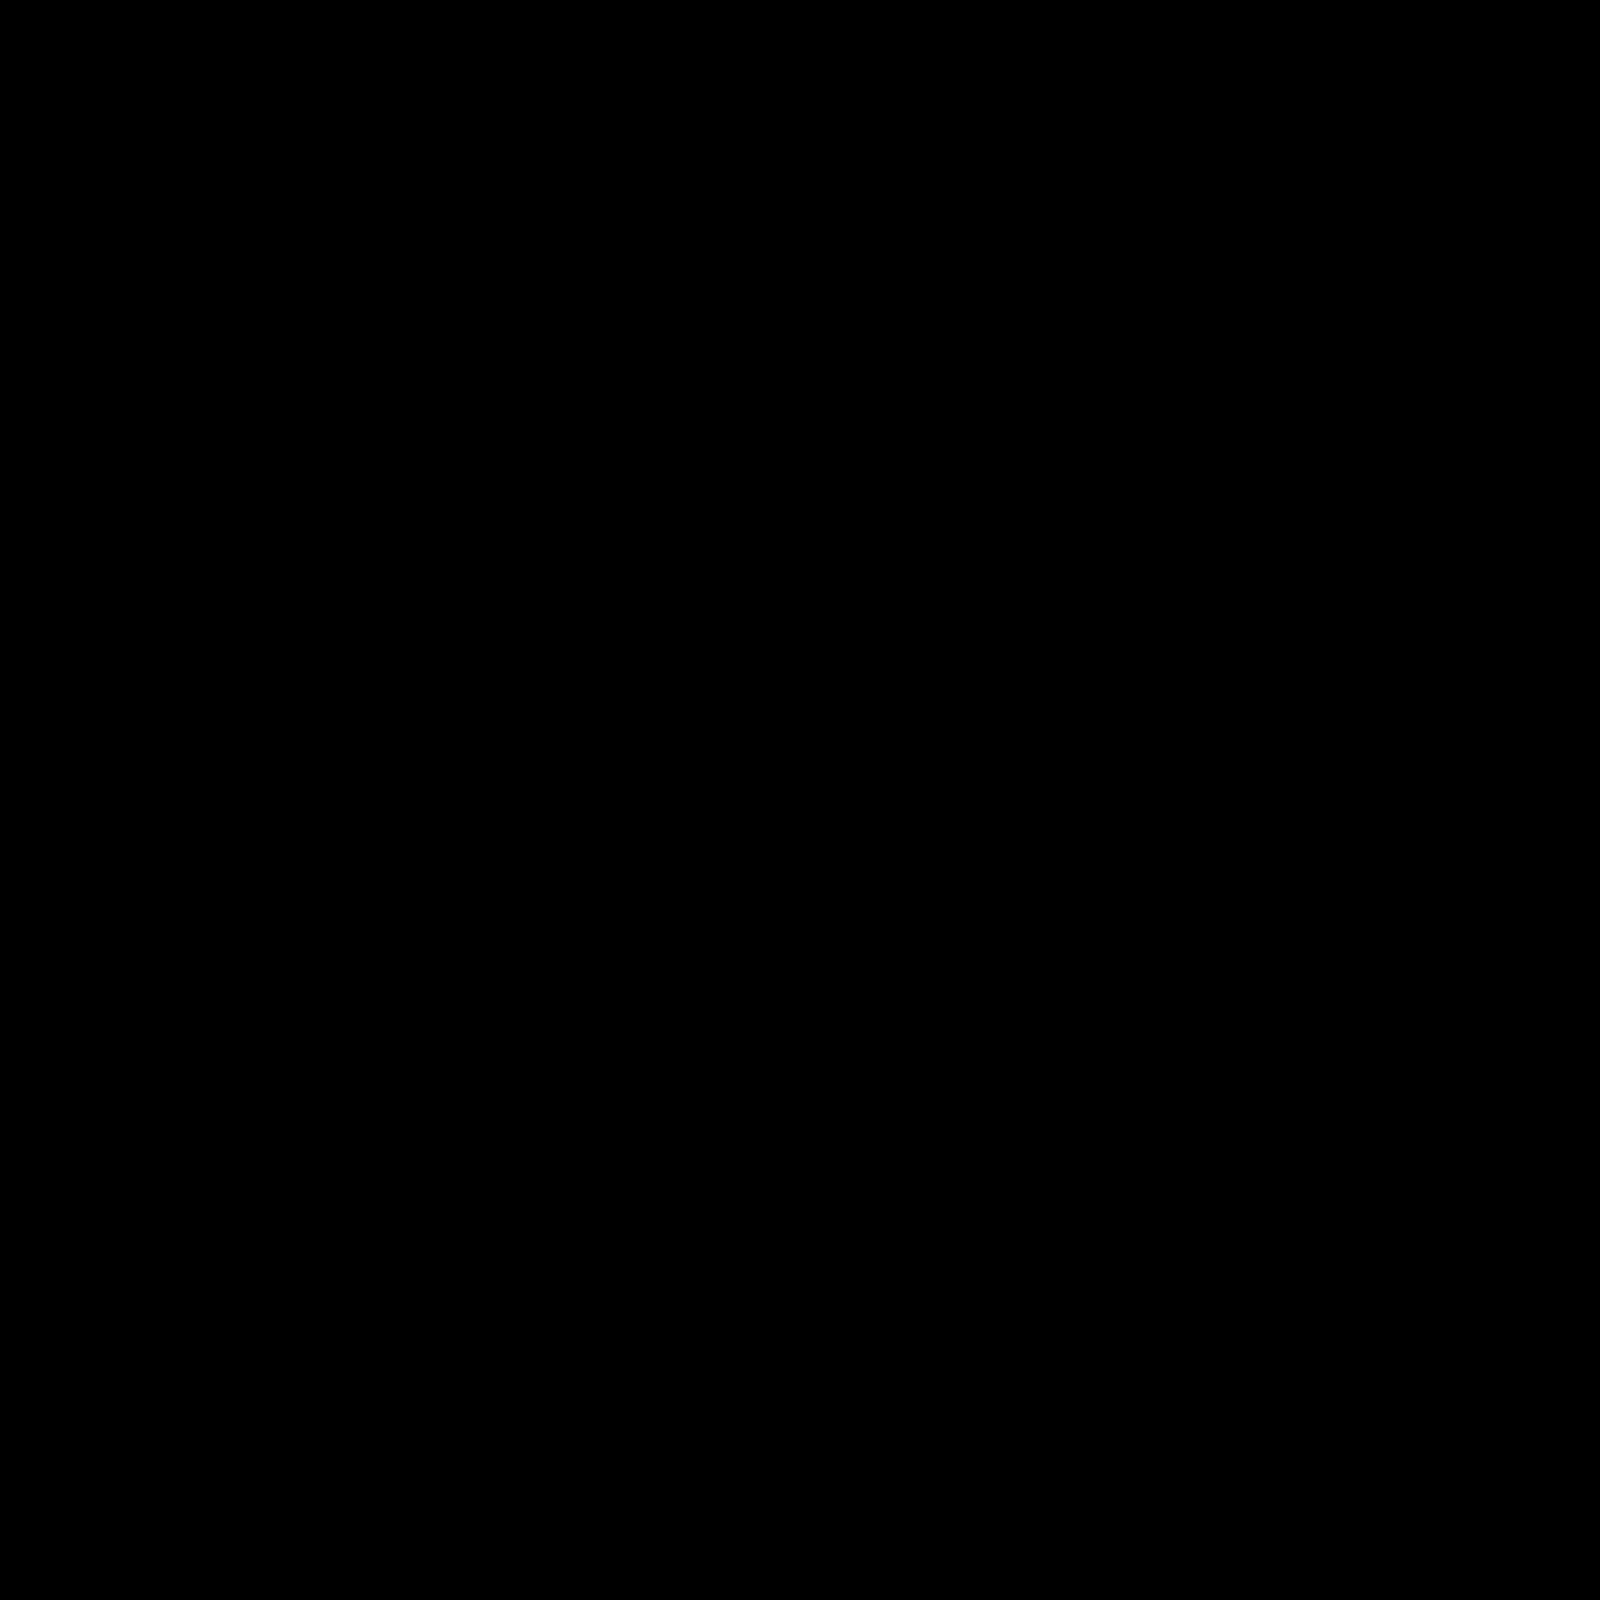 Браузер с прокси сервером тор hydra законно ли использовать тор браузер hydraruzxpnew4af